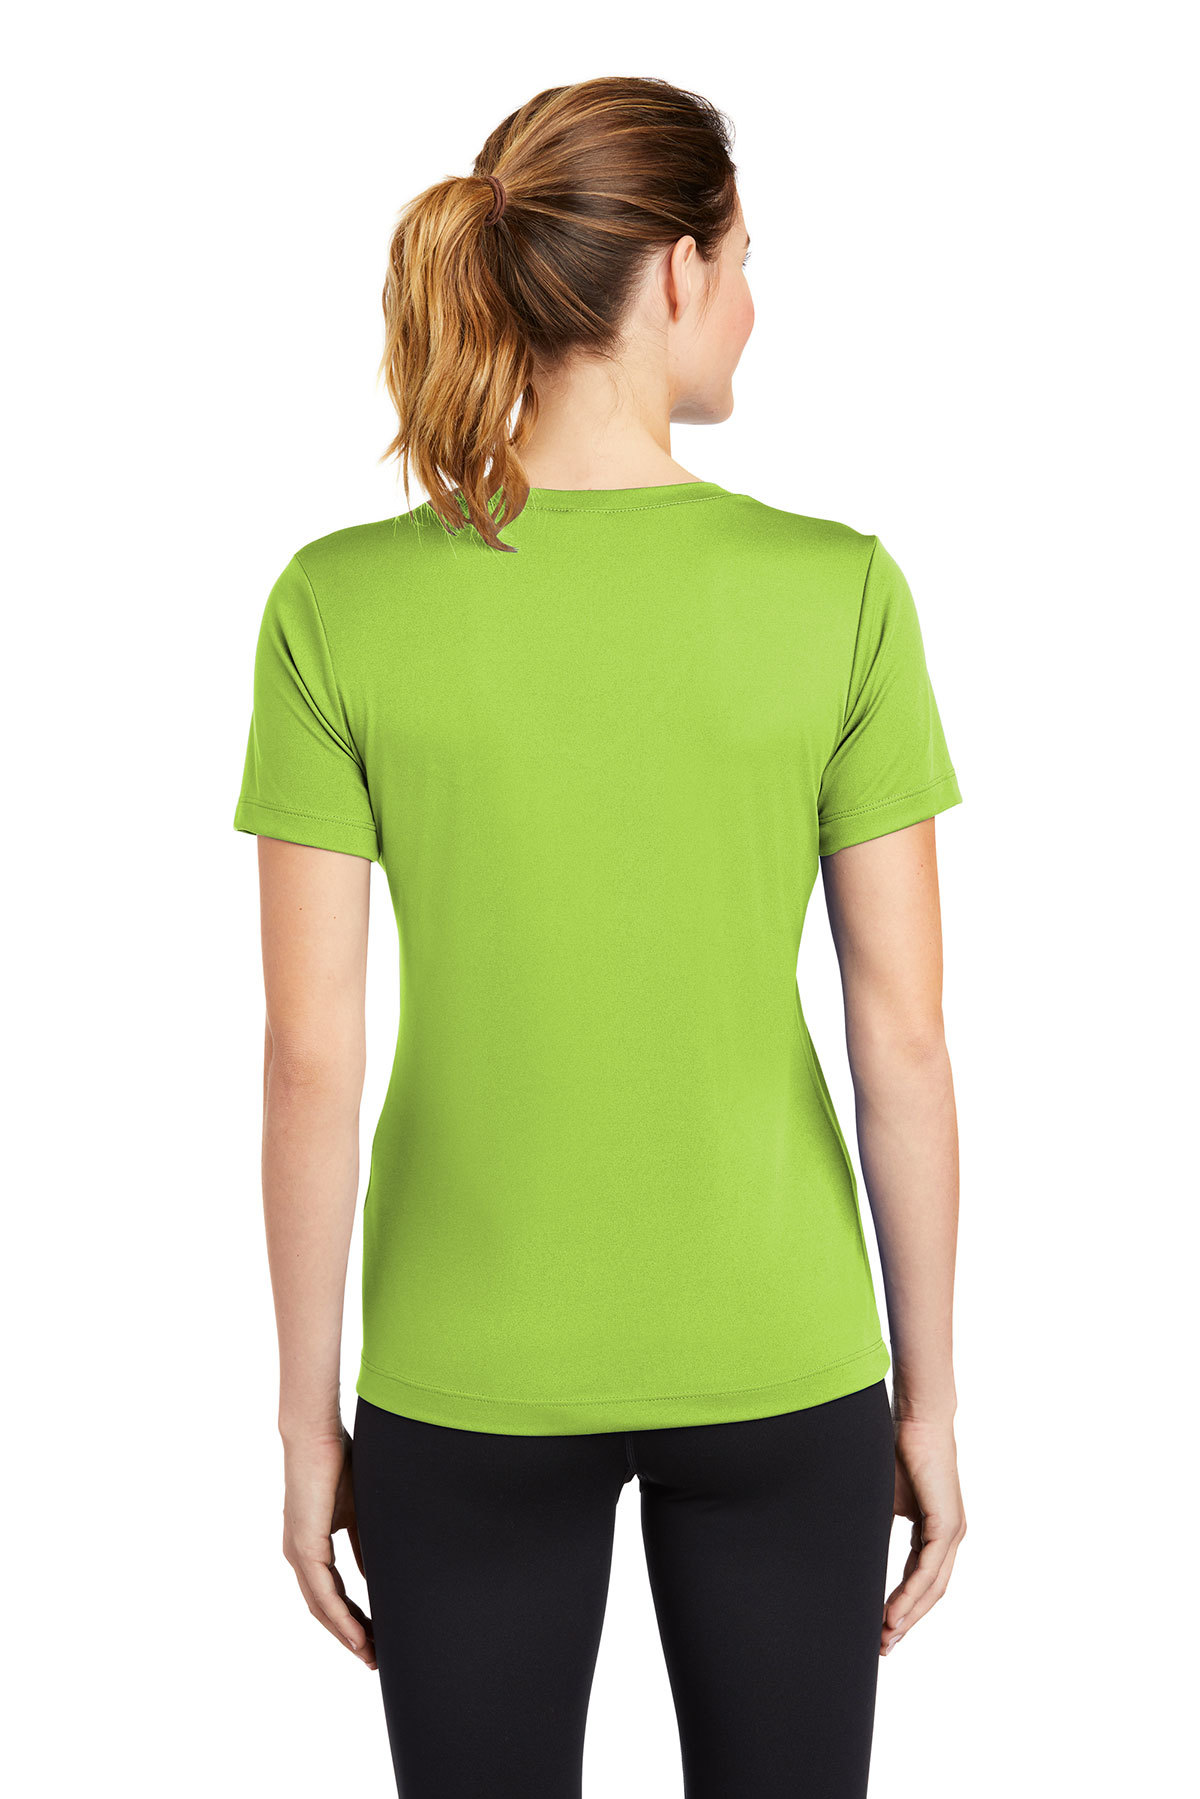 Anhyzer Designs Addicted to Kayaking Ladies Sport Tek Brand PosiCharge Competitor Polyester Performance Short Sleeve Tee